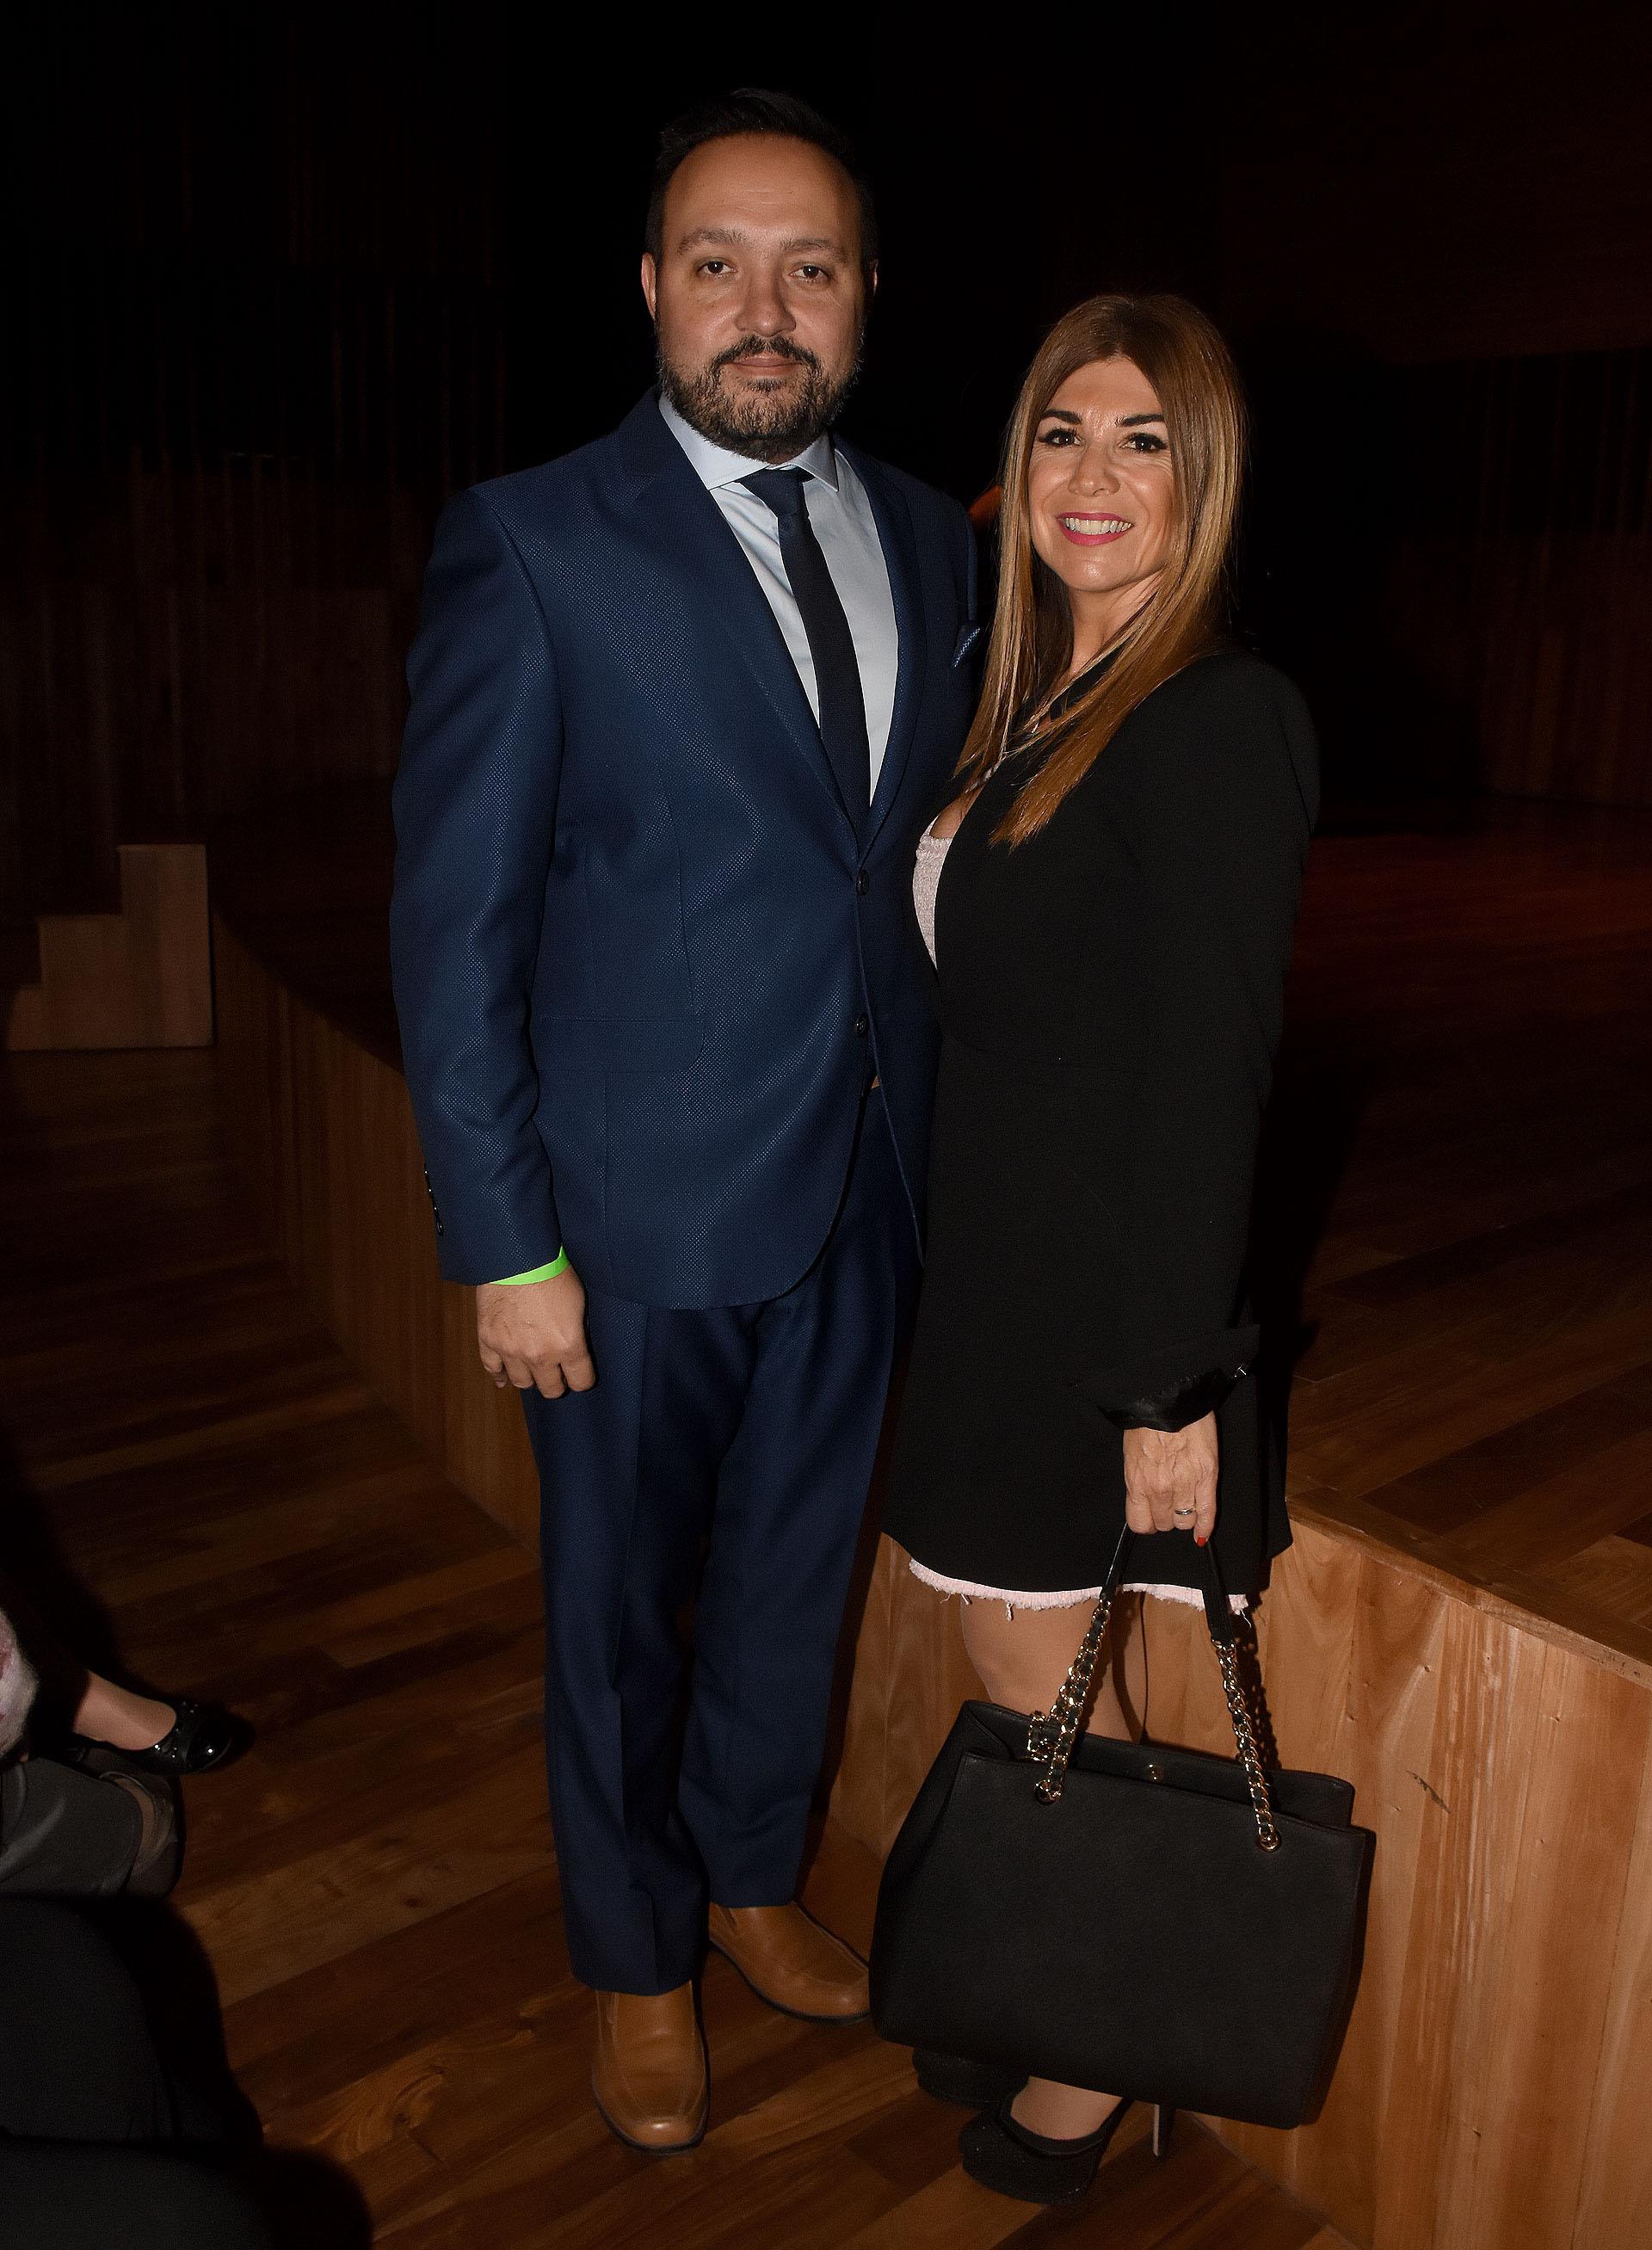 Diego Cani y Lina Anllo